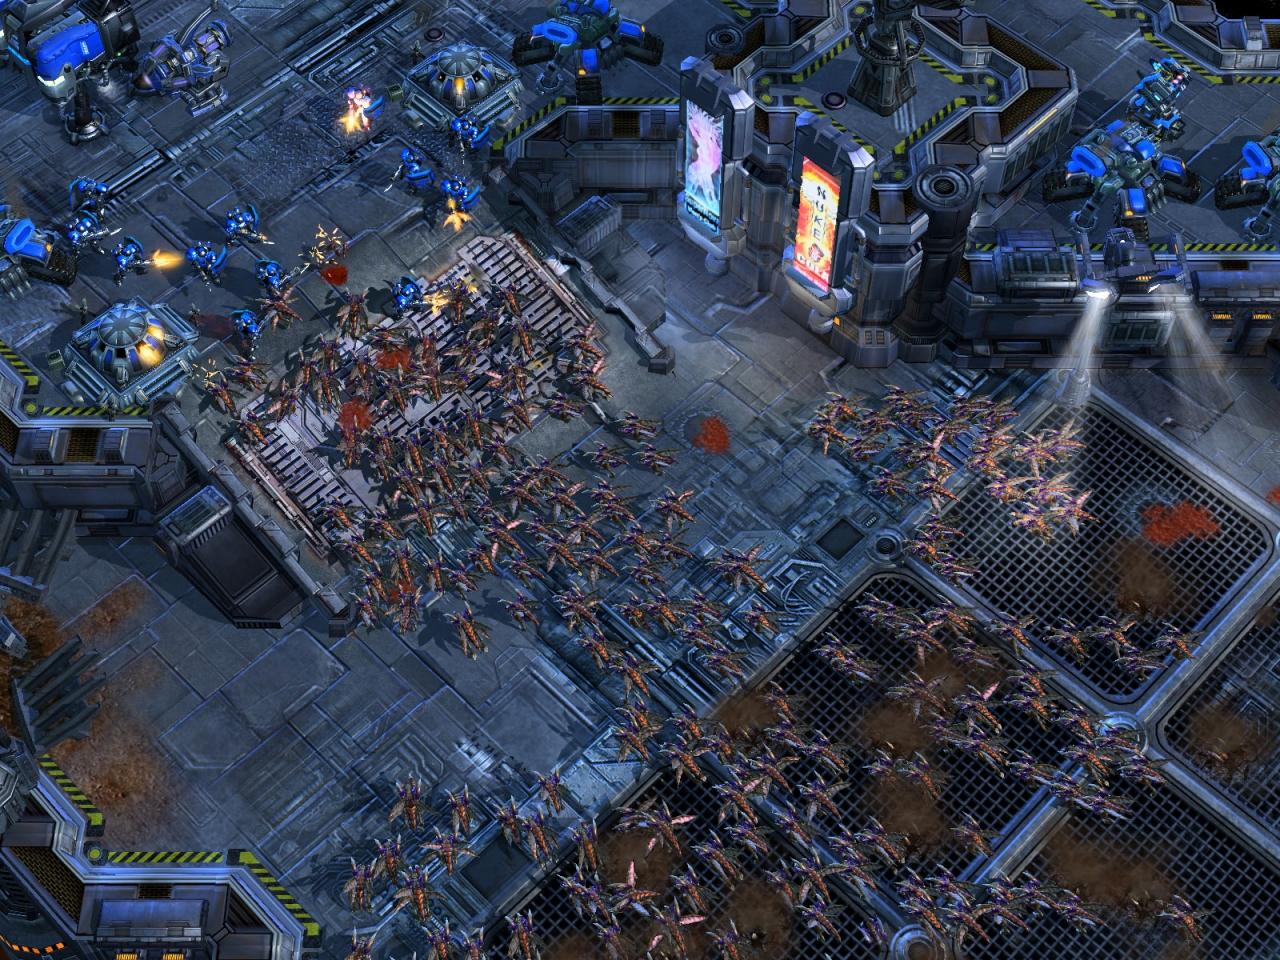 StarCraft II promo art